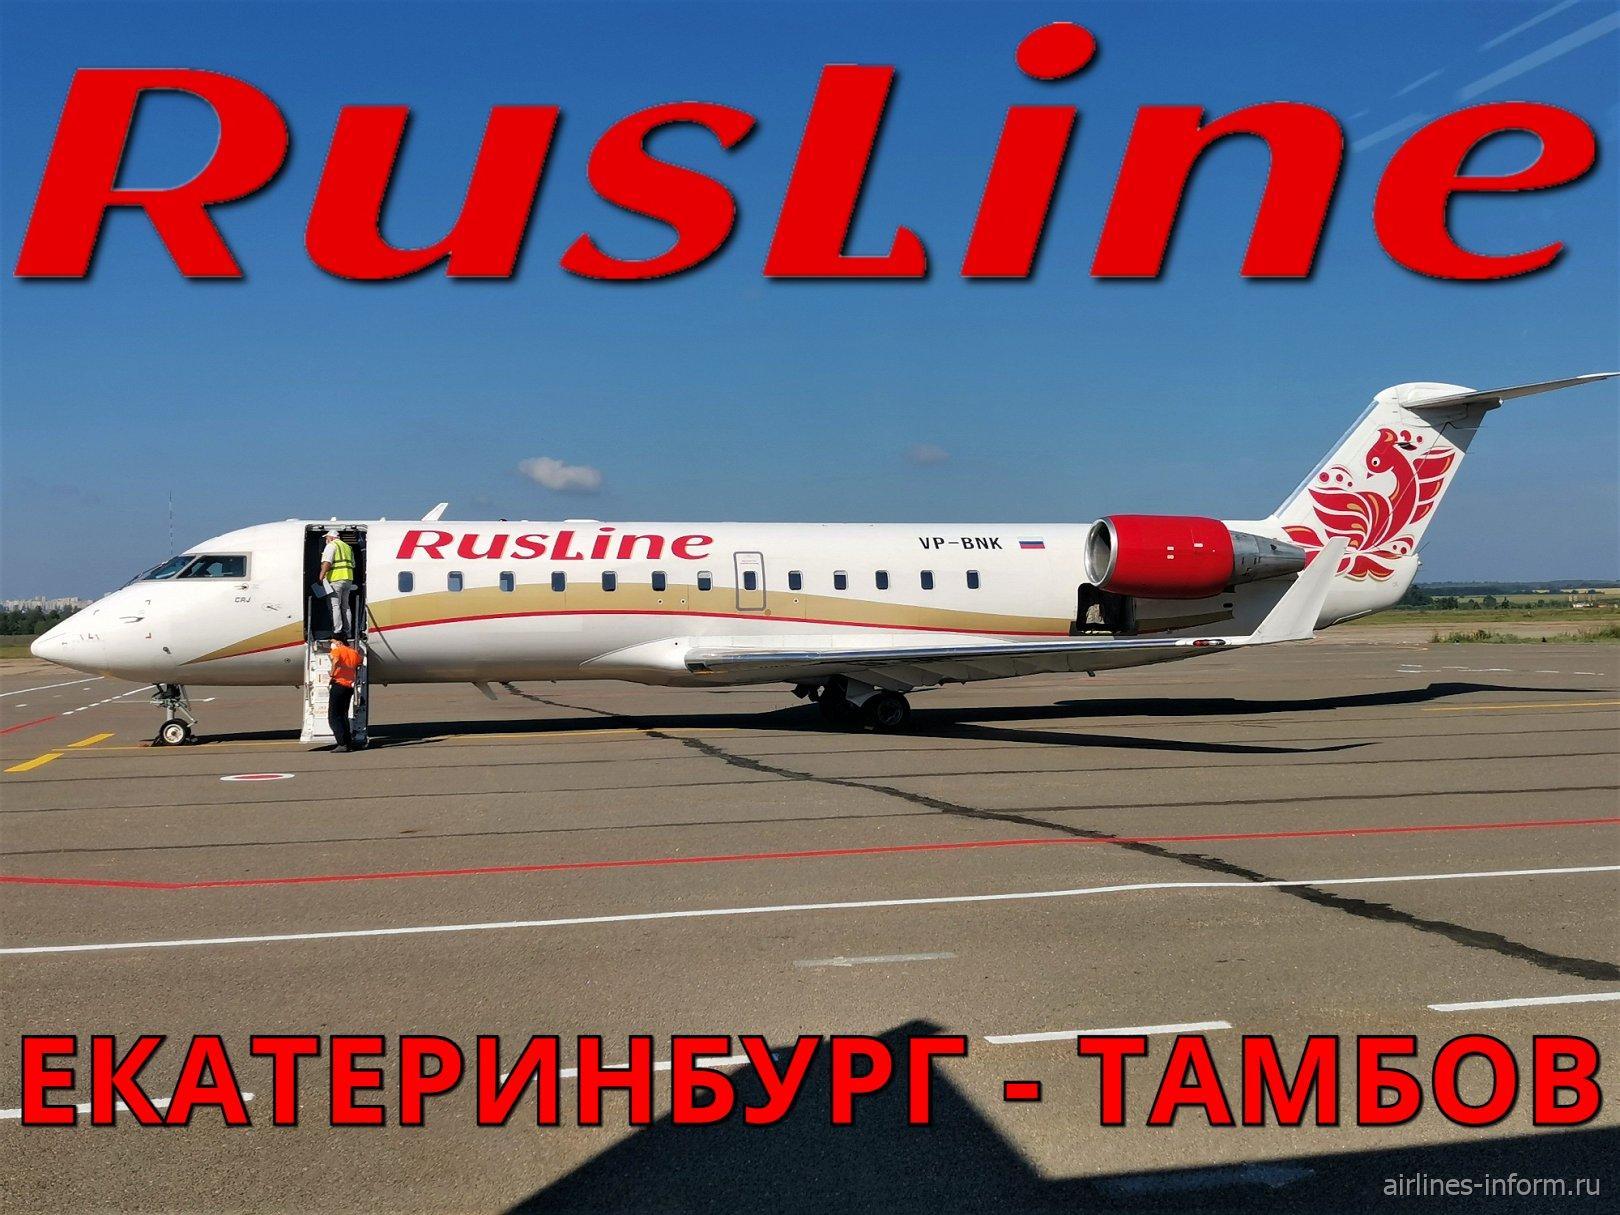 РусЛайн: Екатеринбург - Тамбов